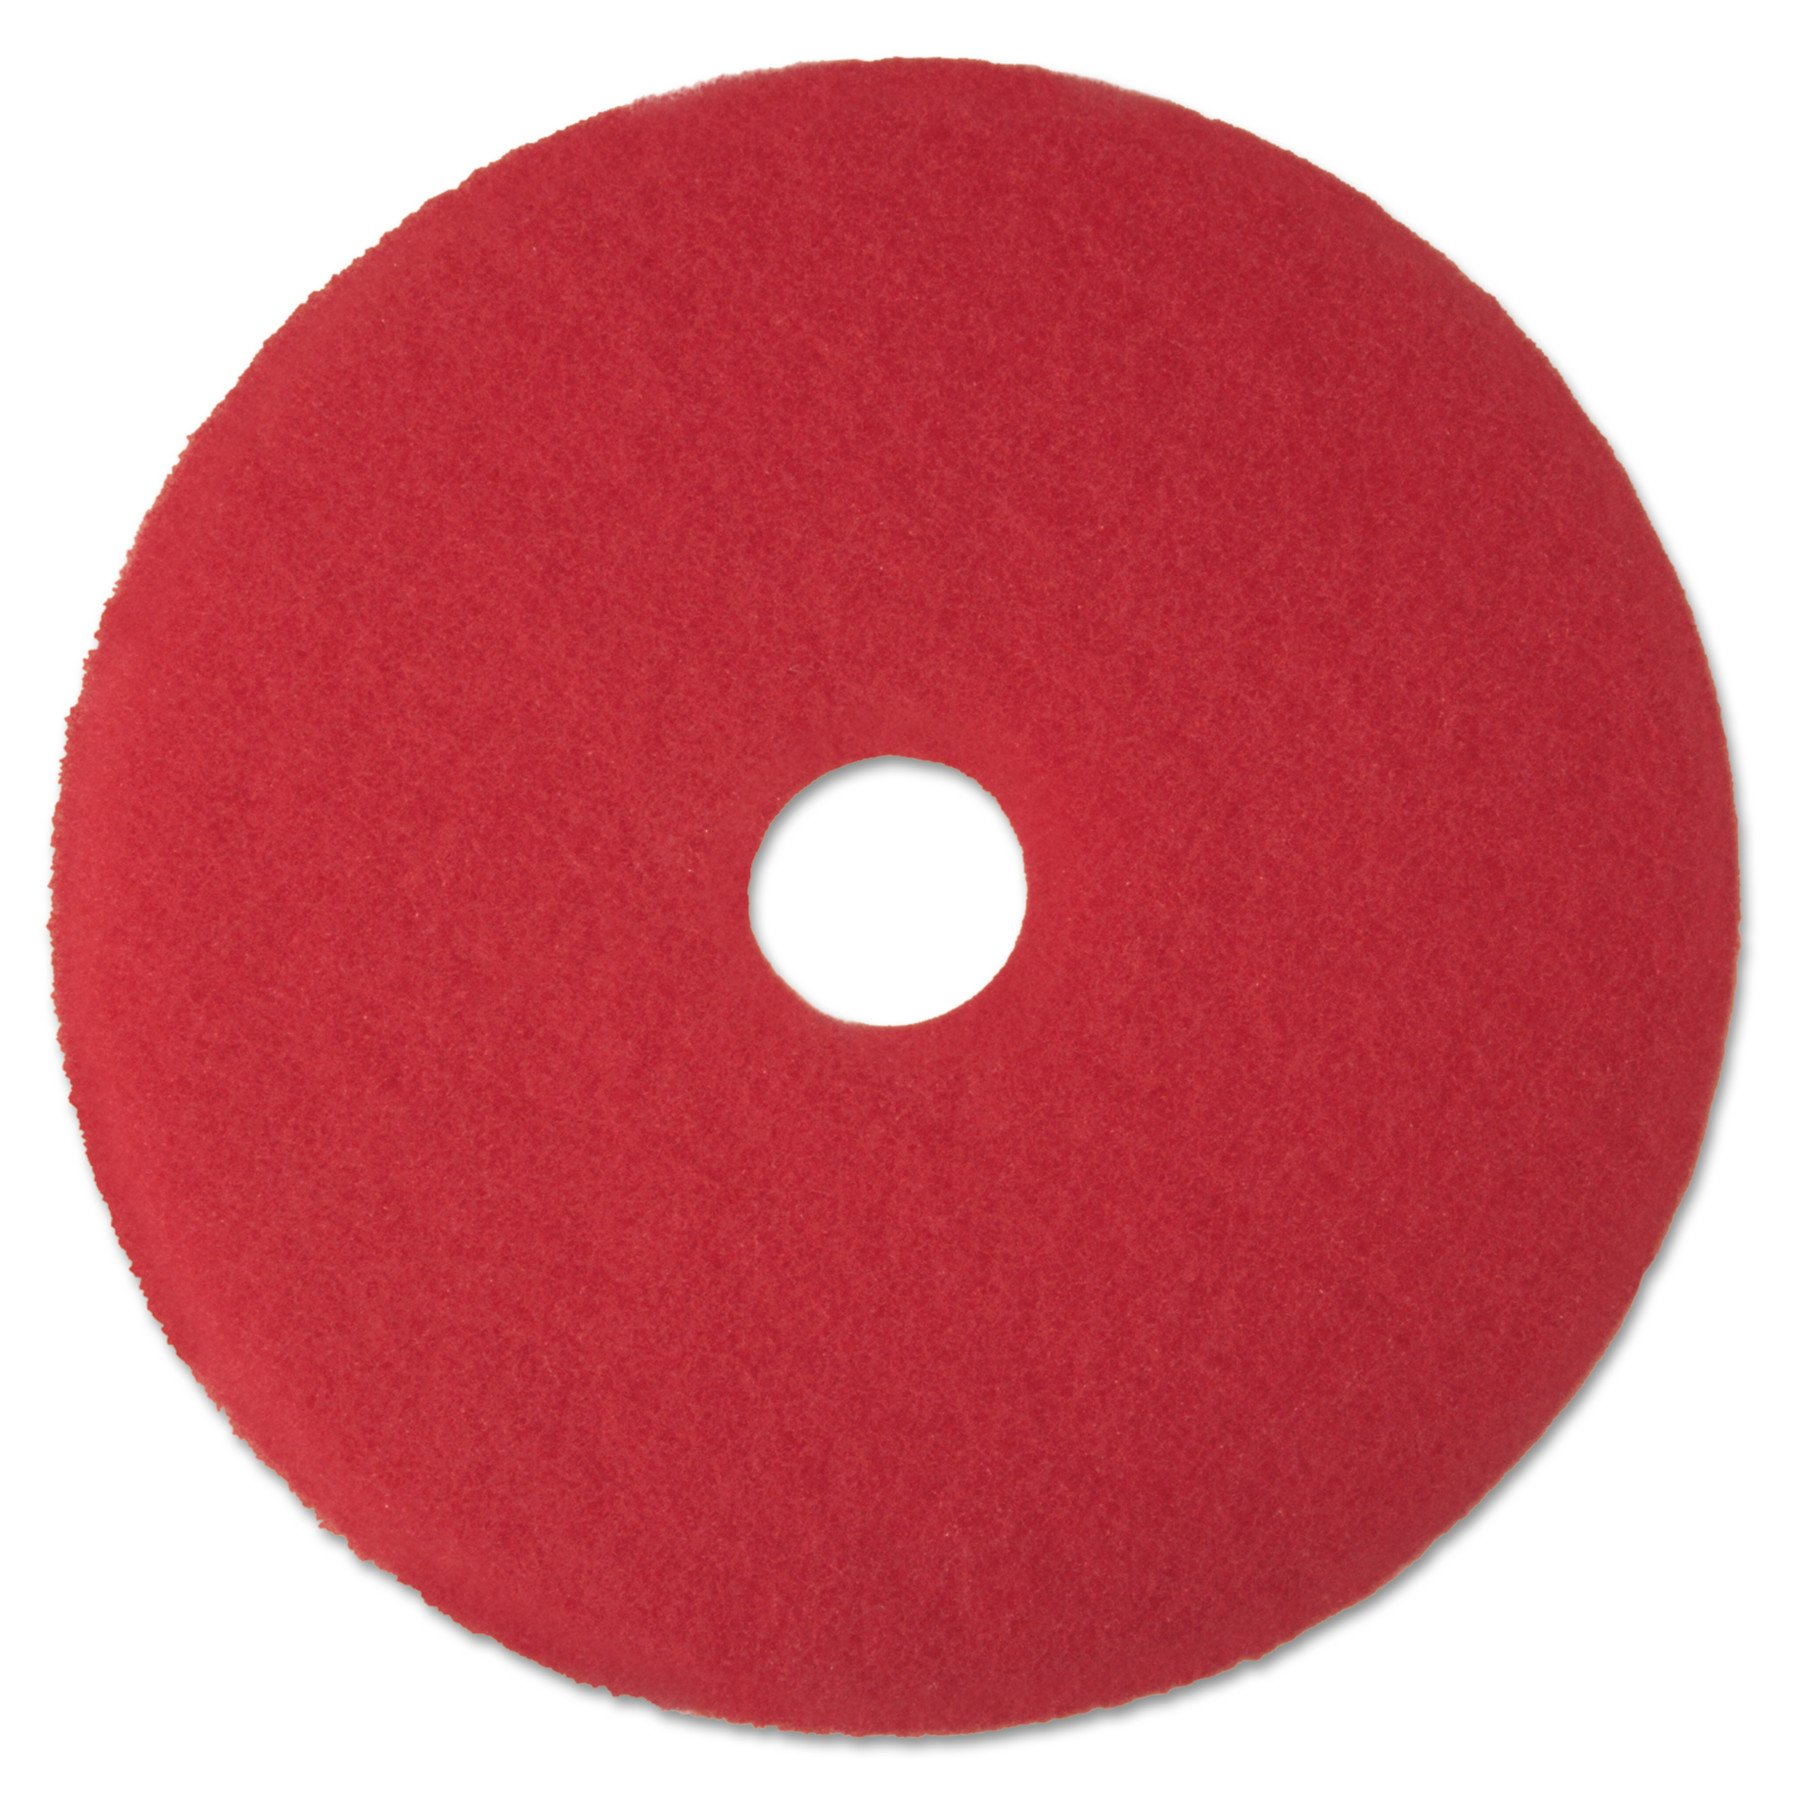 3M Red Buffer Pad 5100, 19'' Floor Buffer, Machine Use (Case of 5)